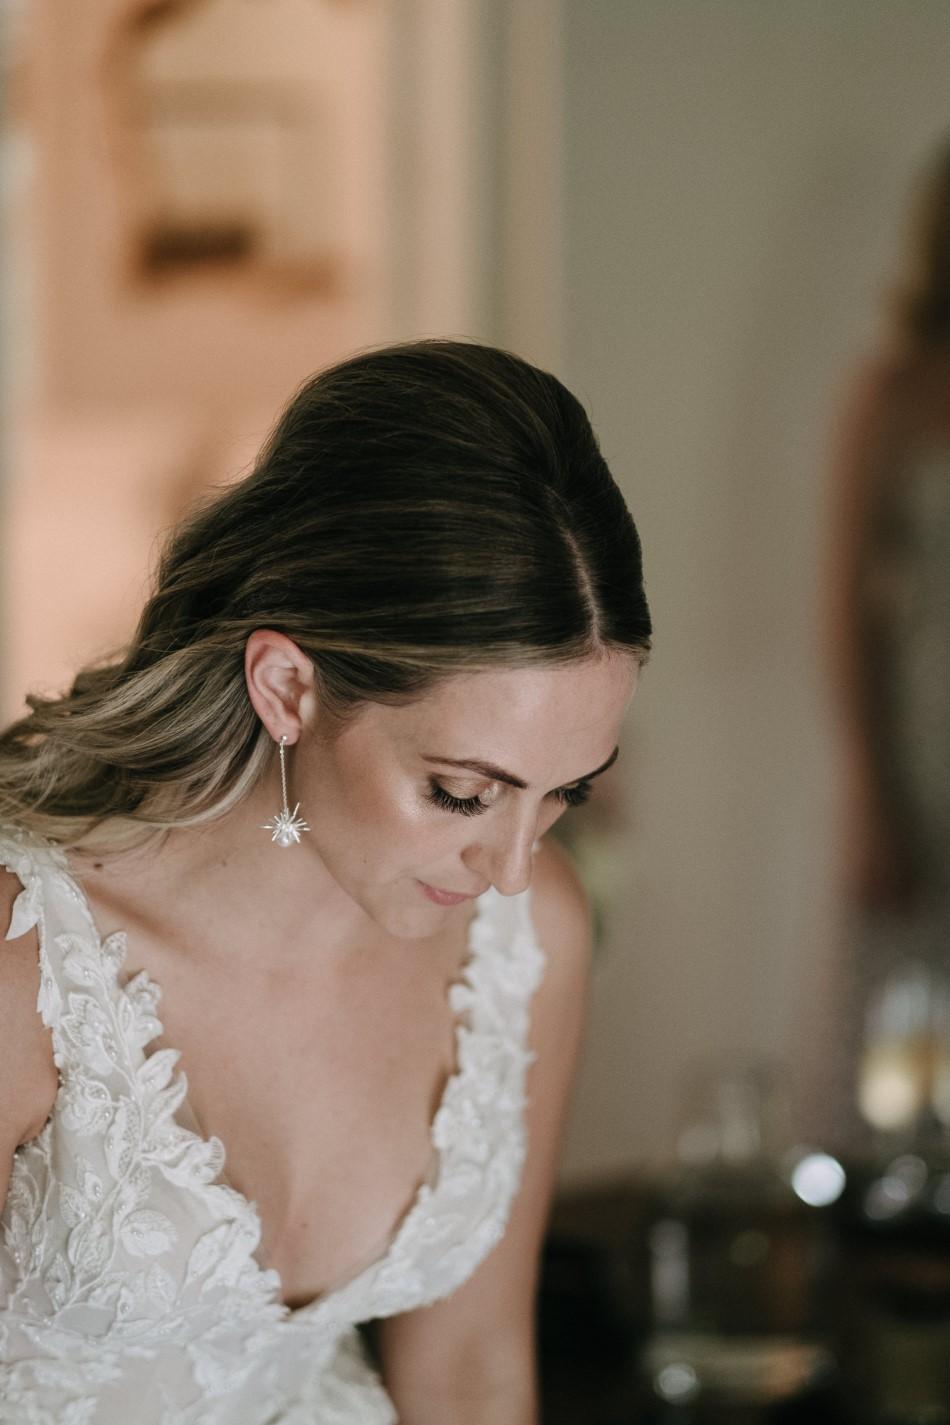 monique lawler makeup_shireshirewedding.com (5).jpg